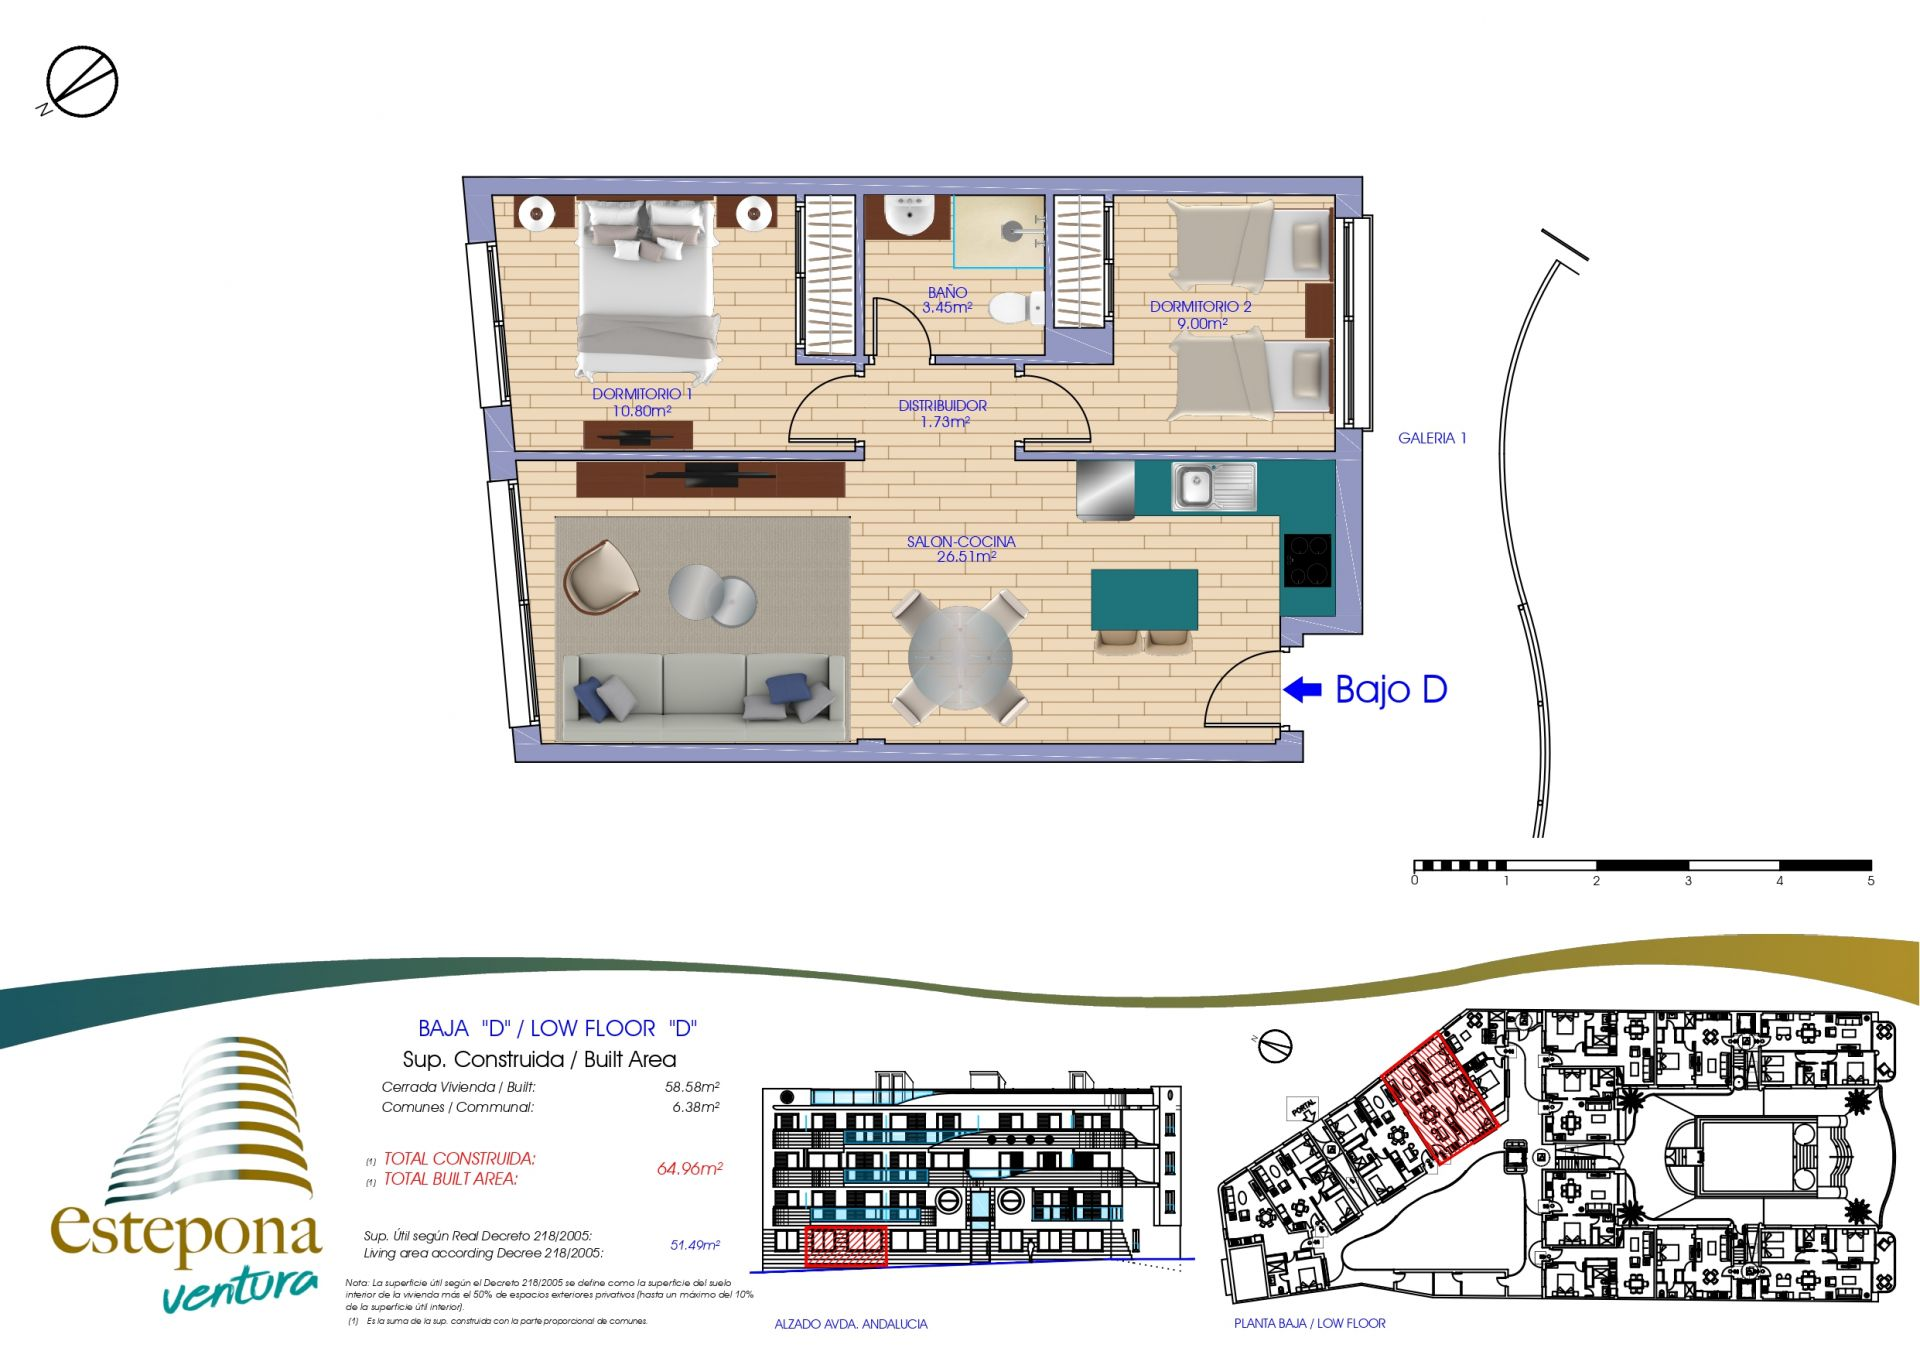 Bd - Ventura Estepona | Compra de casa en Estepona